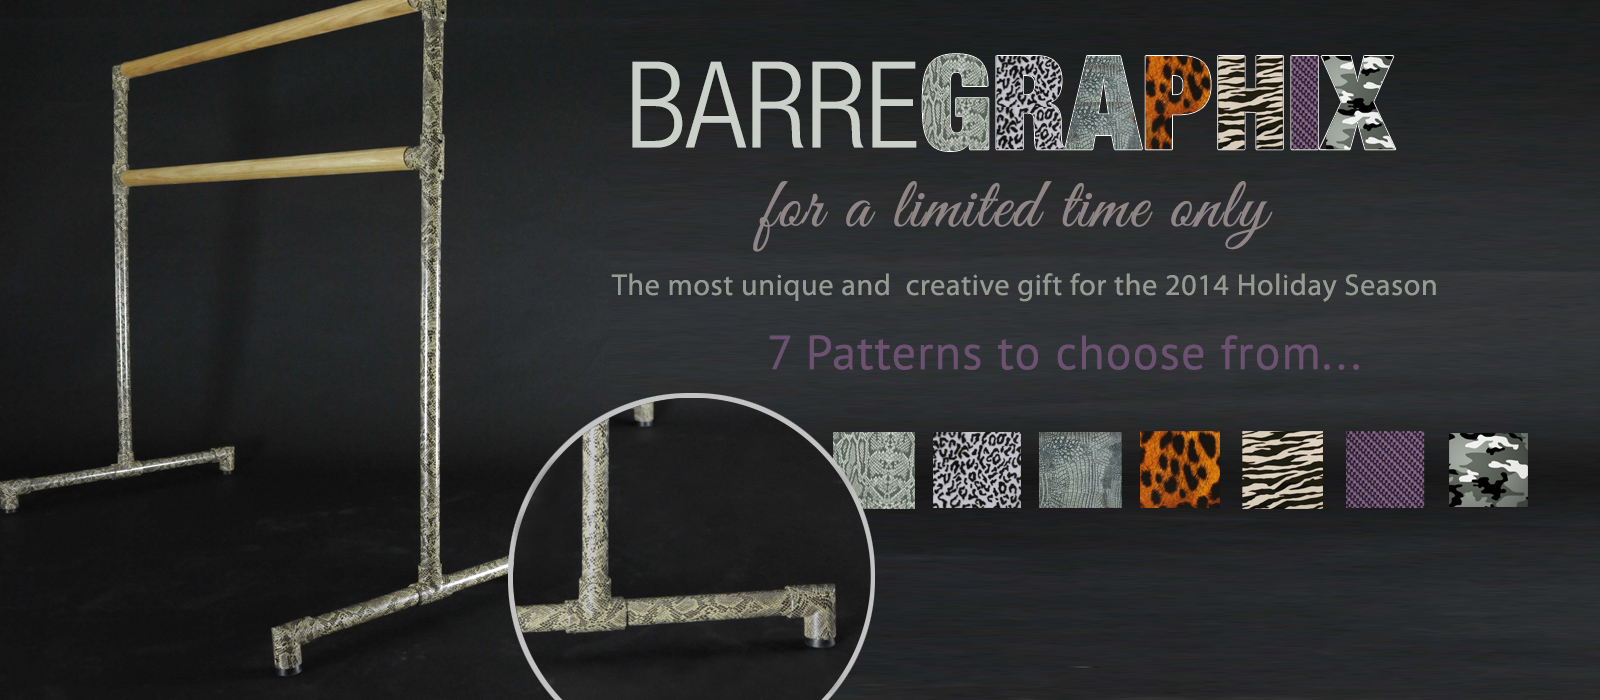 BarreGraphix - Freestanding Barre